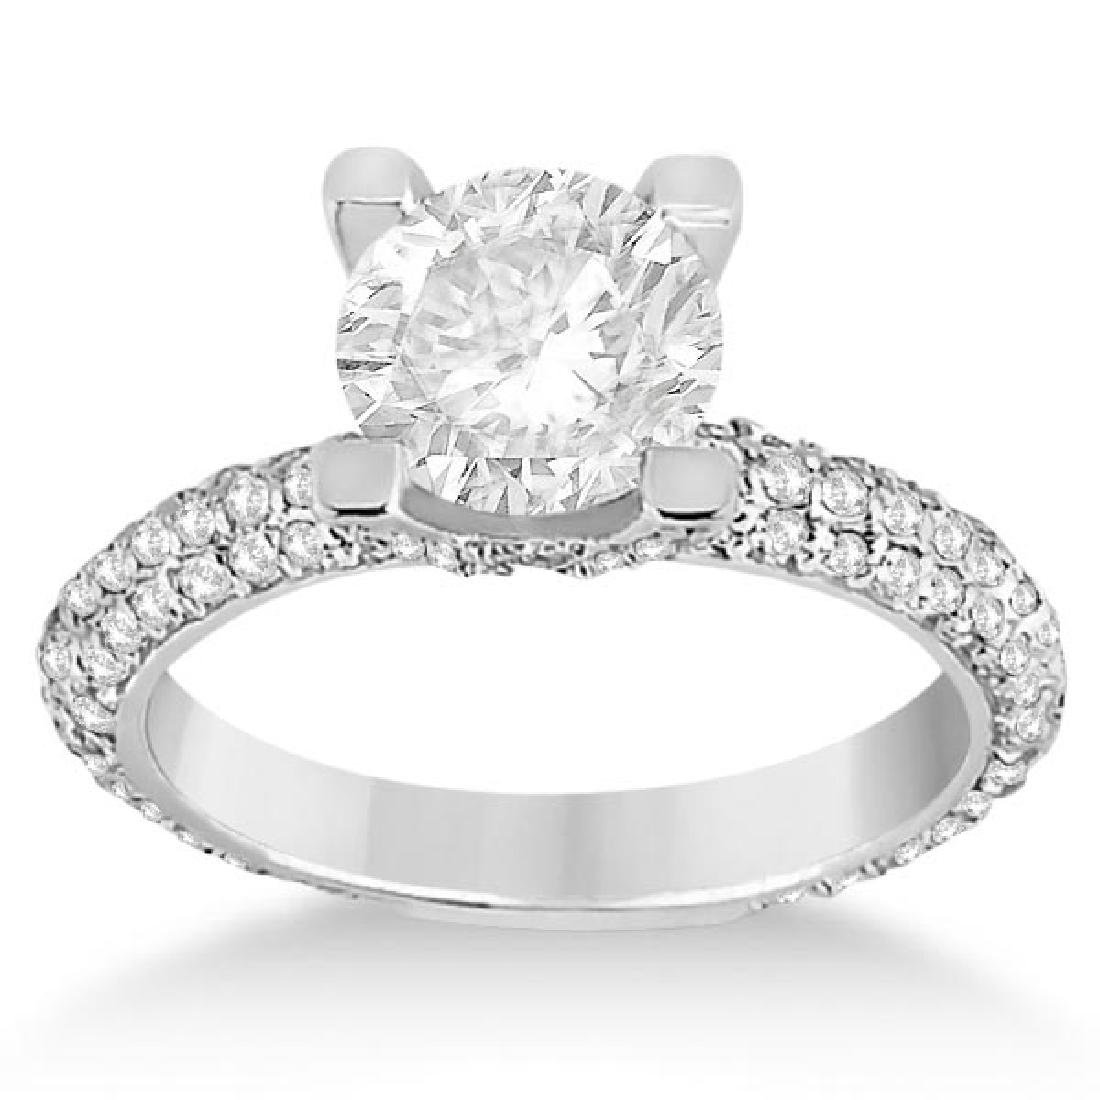 Eternity Pave Set Trio Diamond Engagement Ring 14K Whit